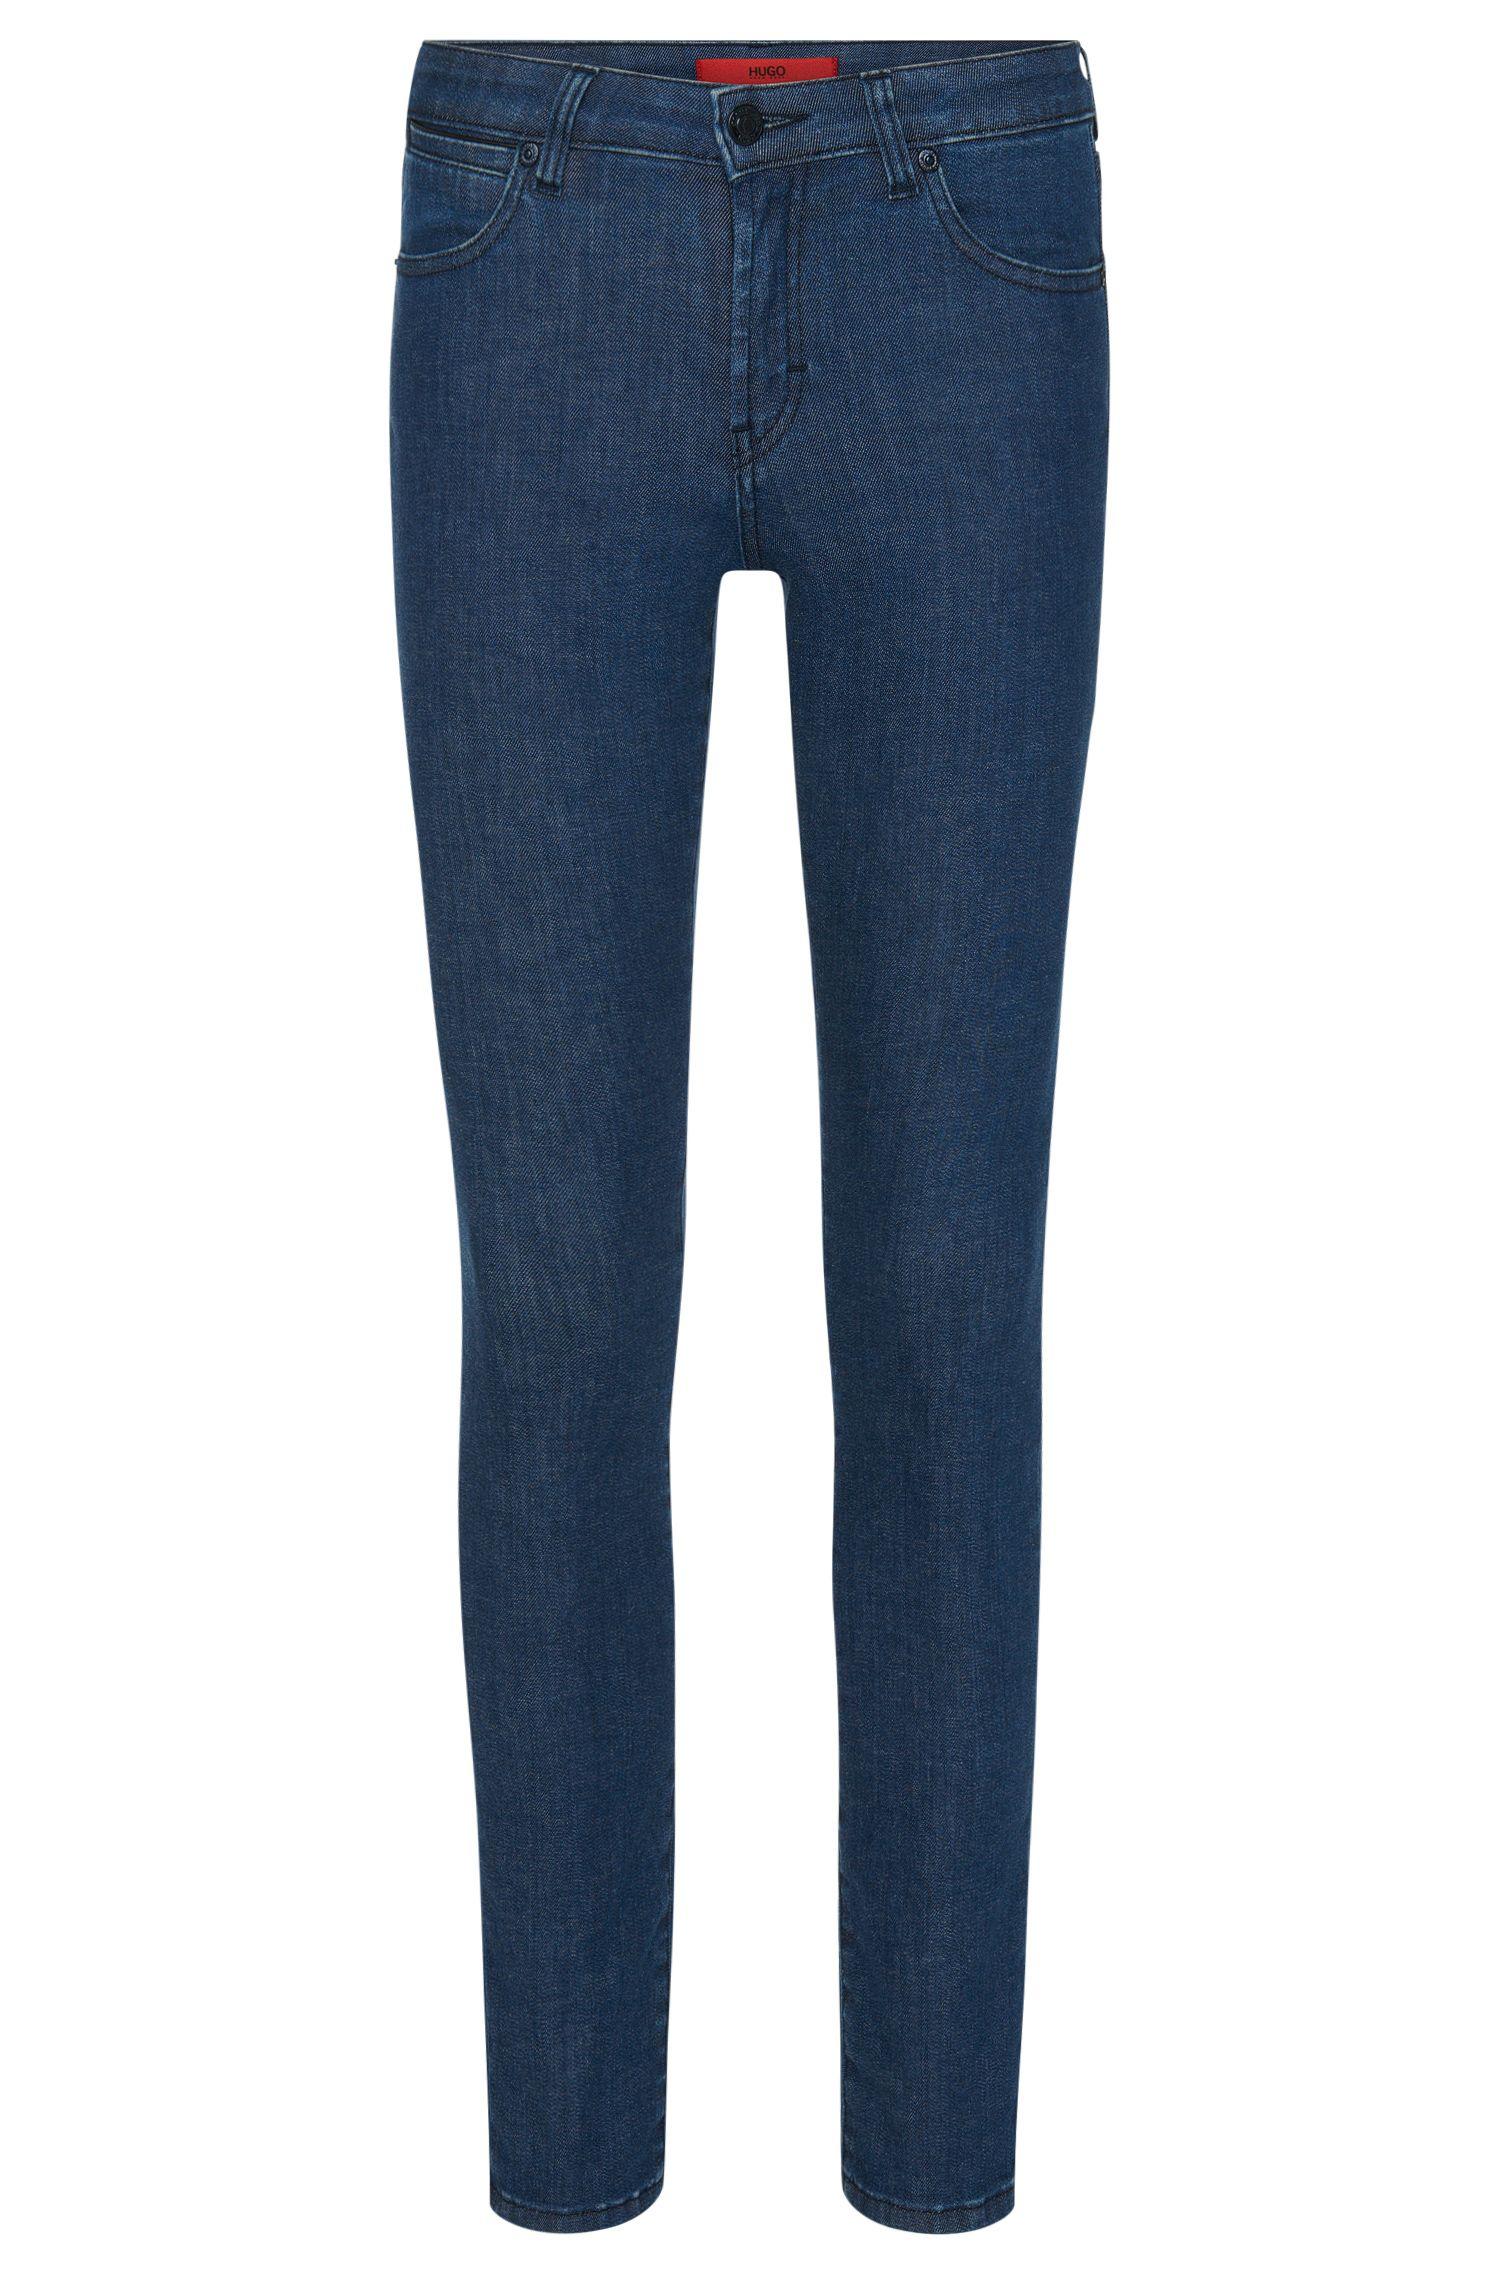 Slim-fit jeans in stretch-cotton blend: 'Genty'